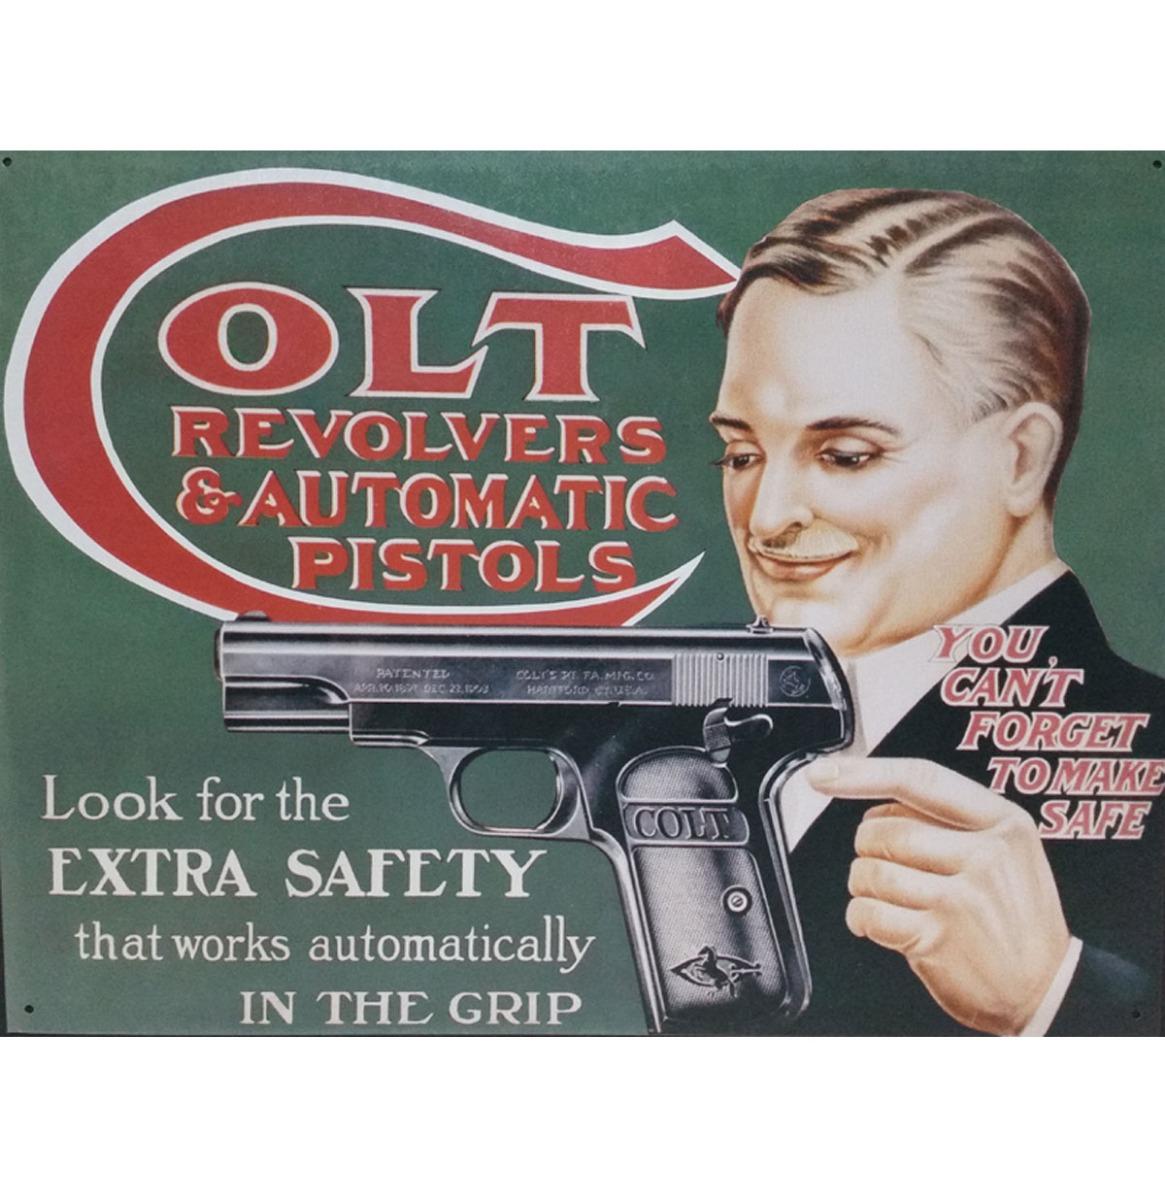 Metalen Poster Colt Revolvers & Automatic Pistols